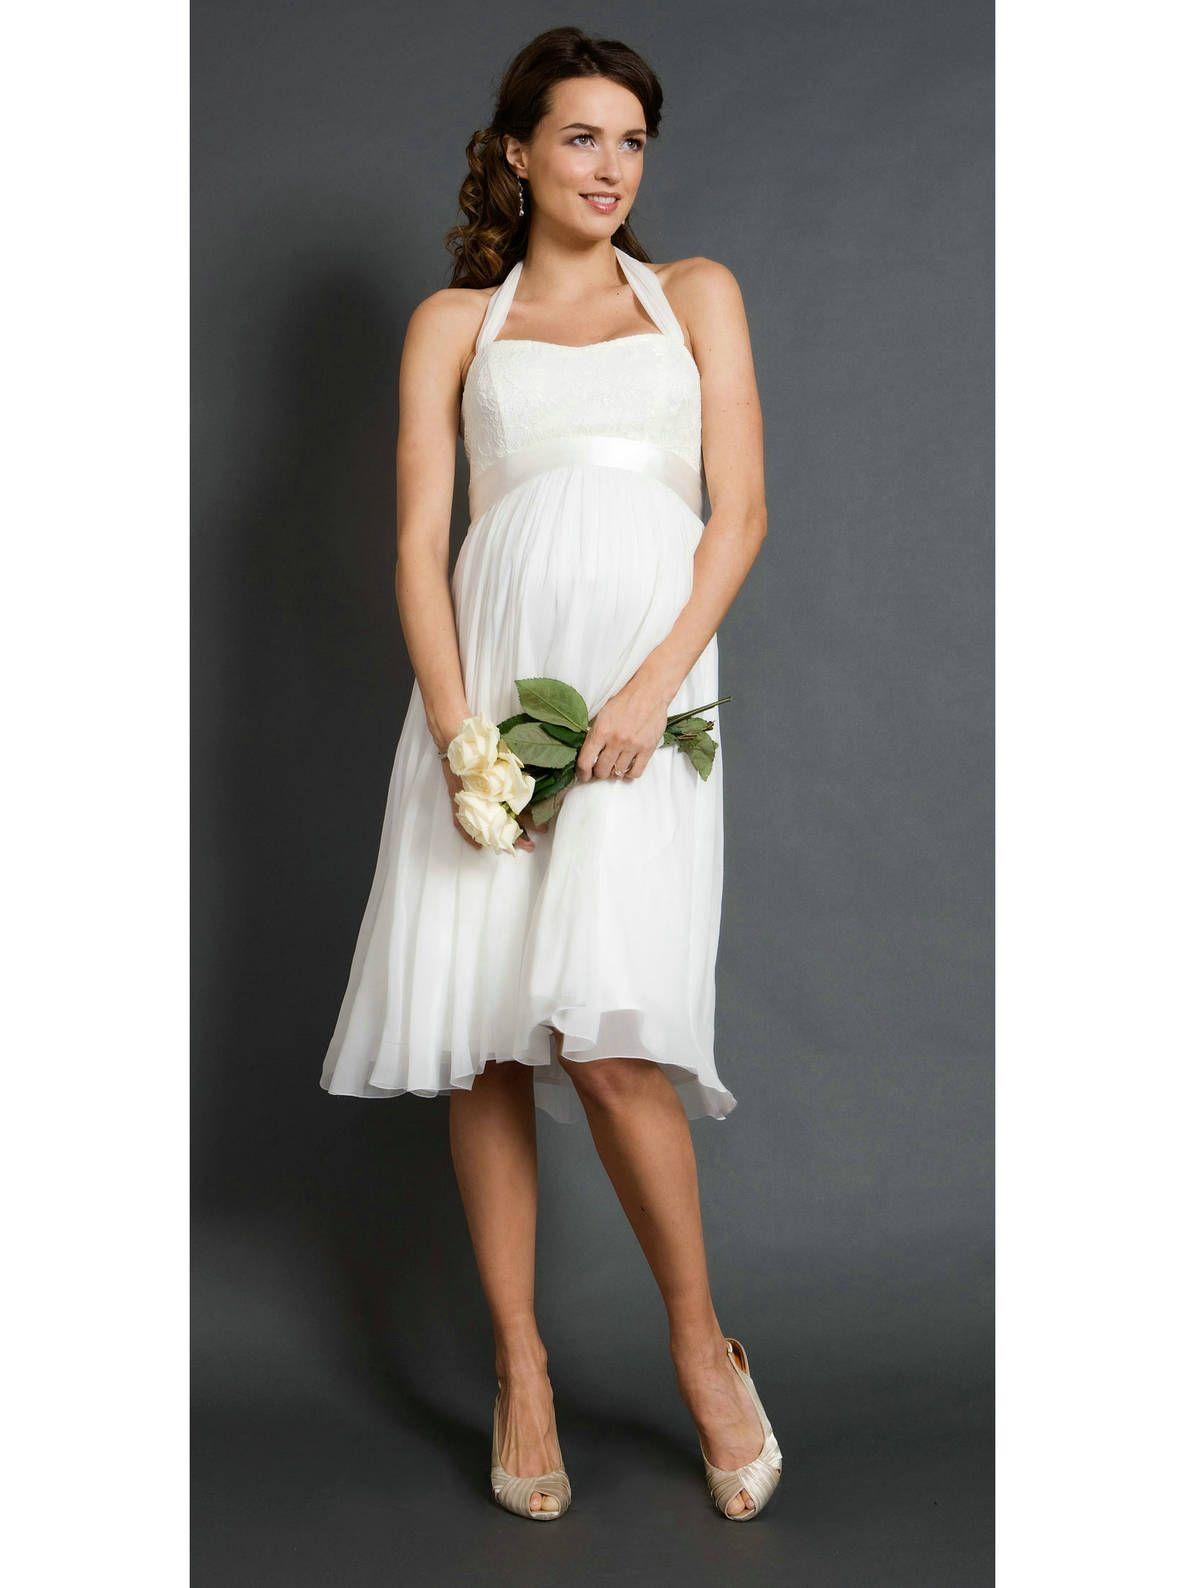 Maternity wedding dress with sleeves  Pin by Clariola Fenoll Garcia on ROPA CALZADO Y ACCESORIOS